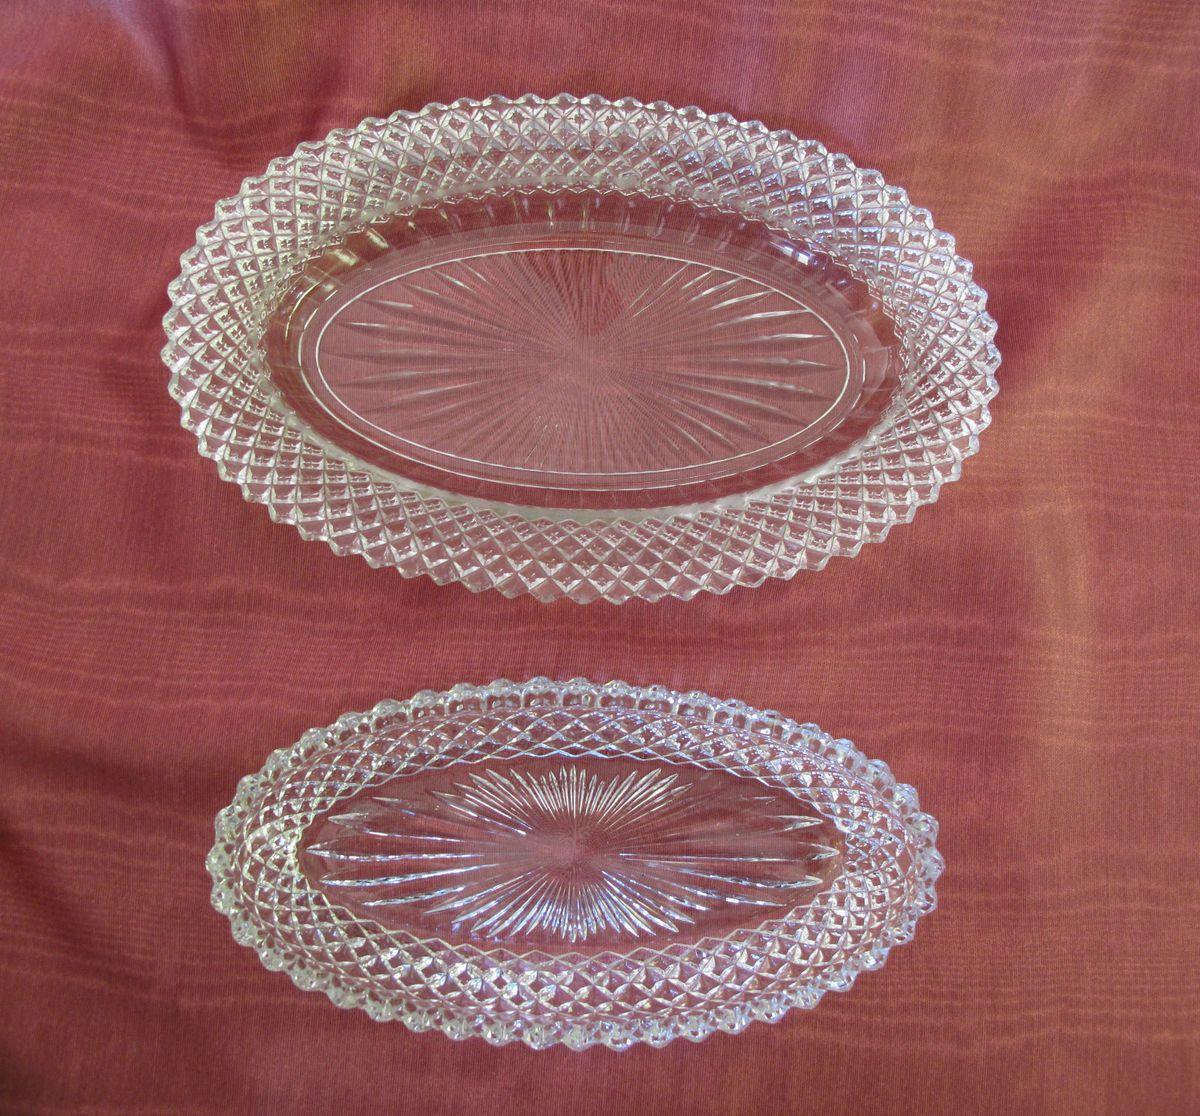 Vintage Elegant Glassware Diamond Point Oval Relish Bowl and Saucer